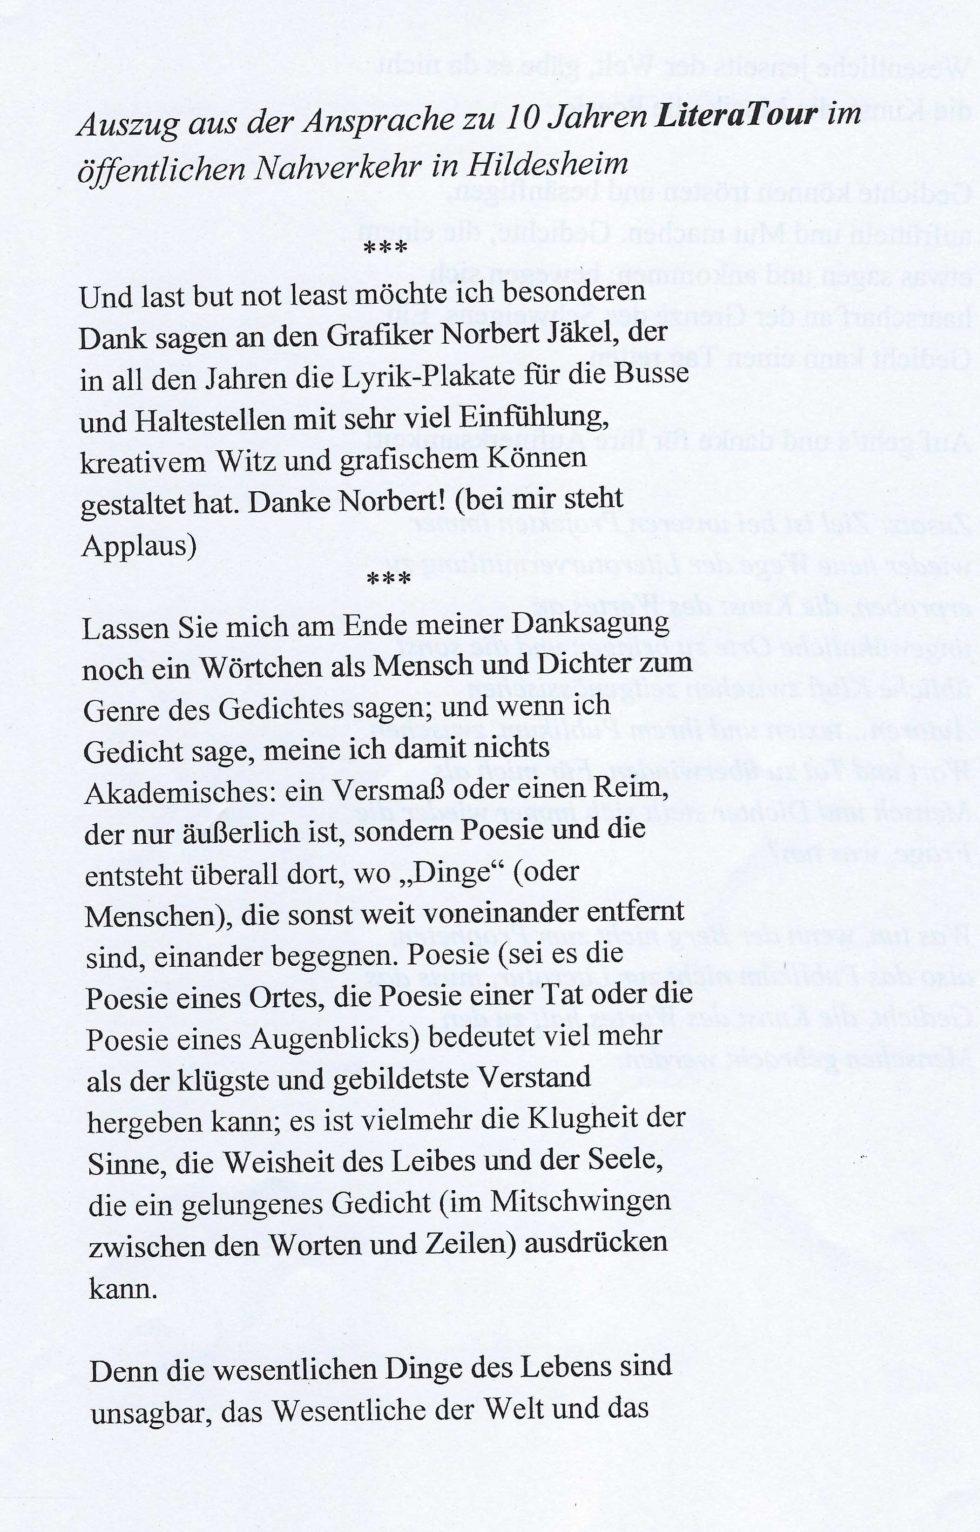 2008_Literatour_10